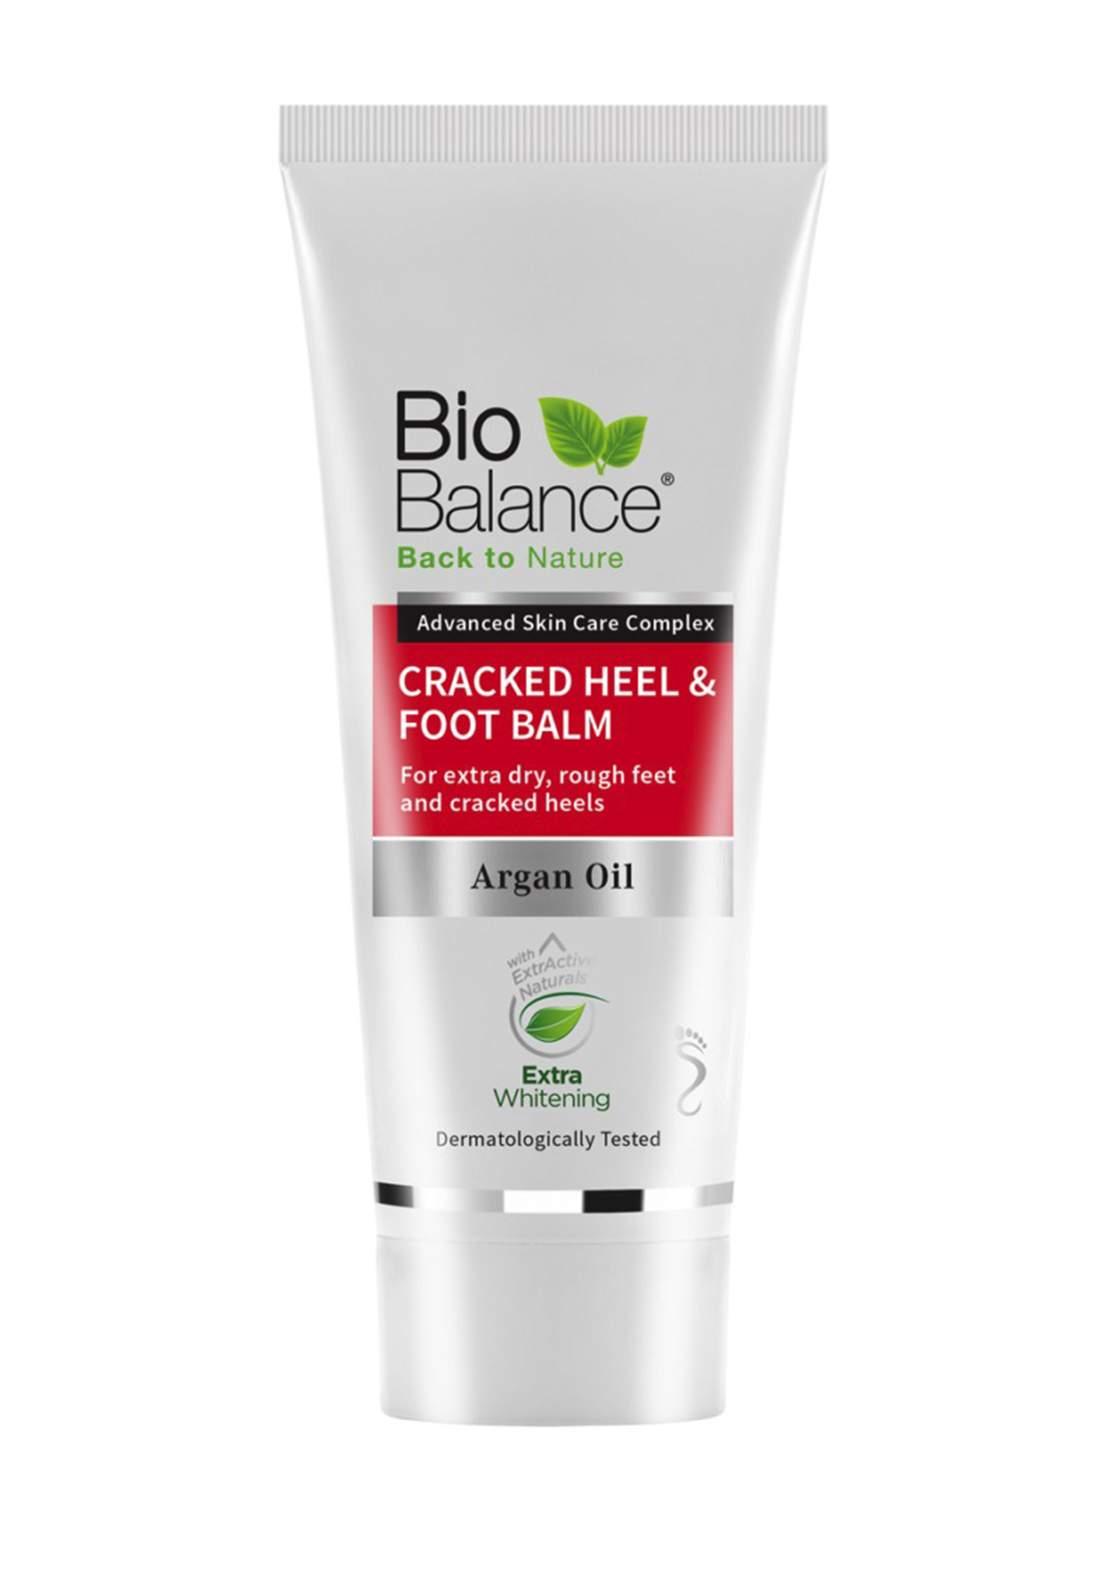 Bio-Balance  Argan Oil Cracked Heel & Foot Balm 60ml كريم للقدم